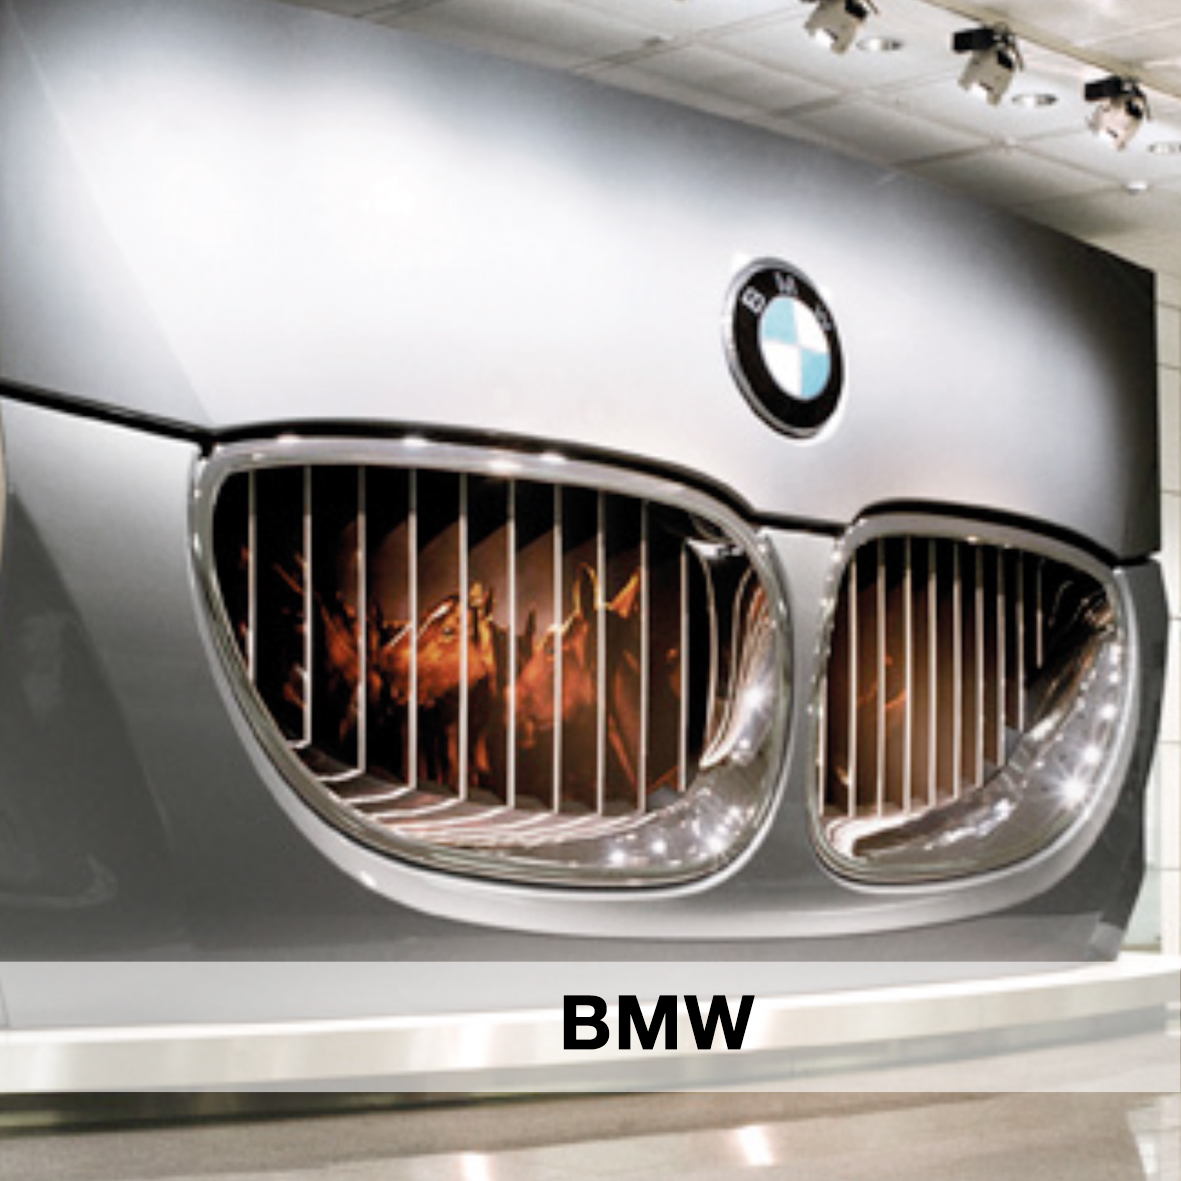 BMW-Thumb.jpg